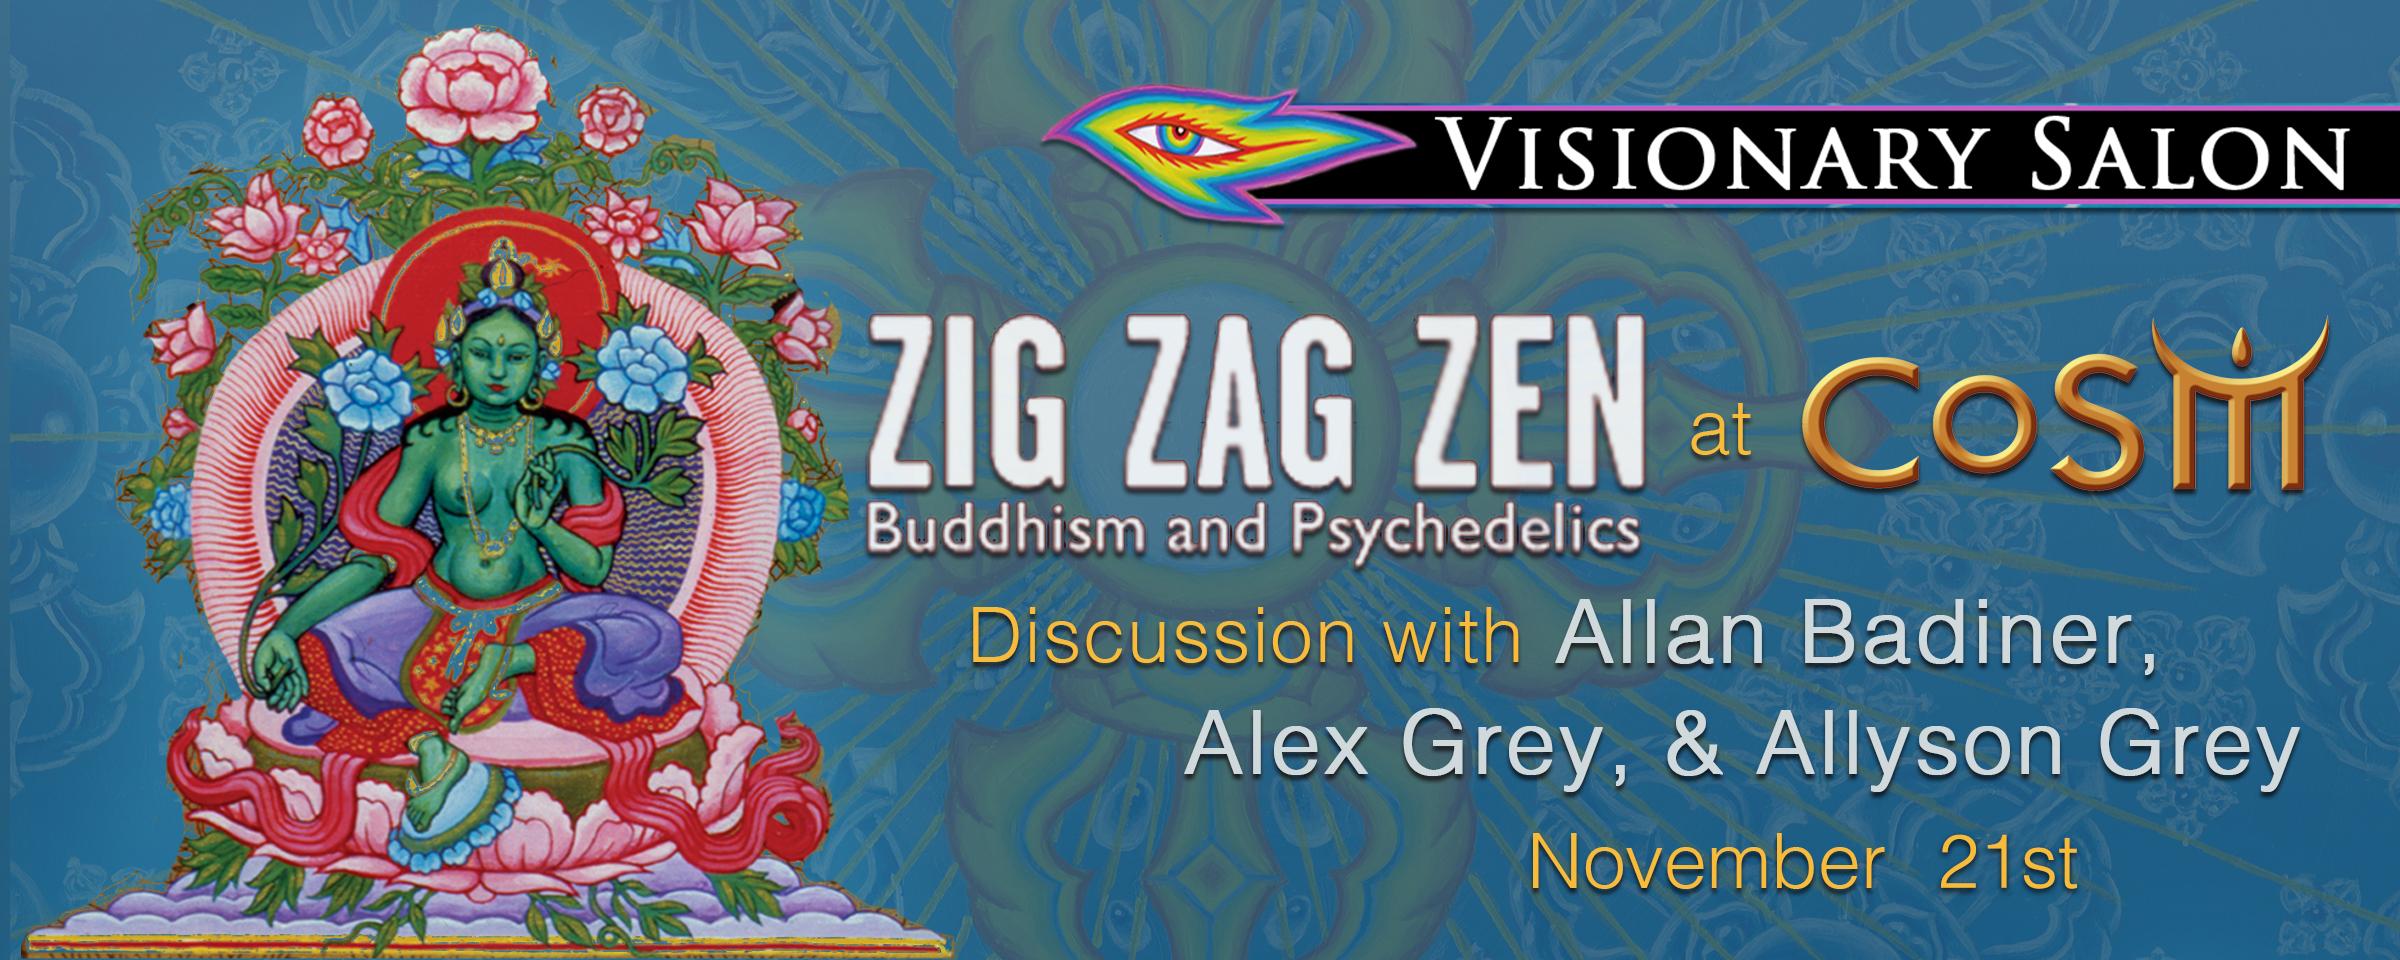 Visionary salon zig zag zen with allan badiner alex grey for A visionary salon